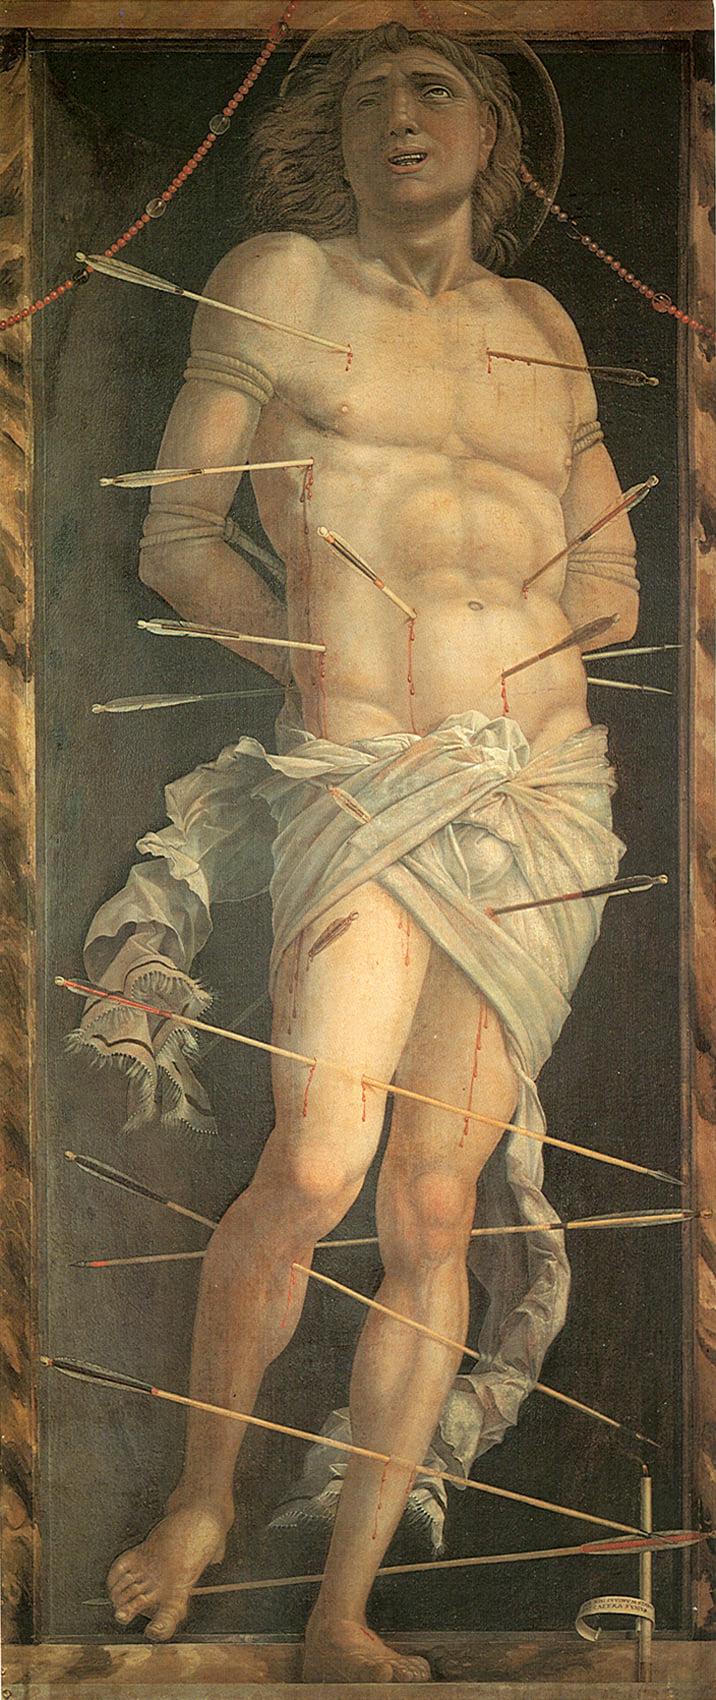 San Sebastiano, Andrea Mantegna, 1506, Ca' d'oro